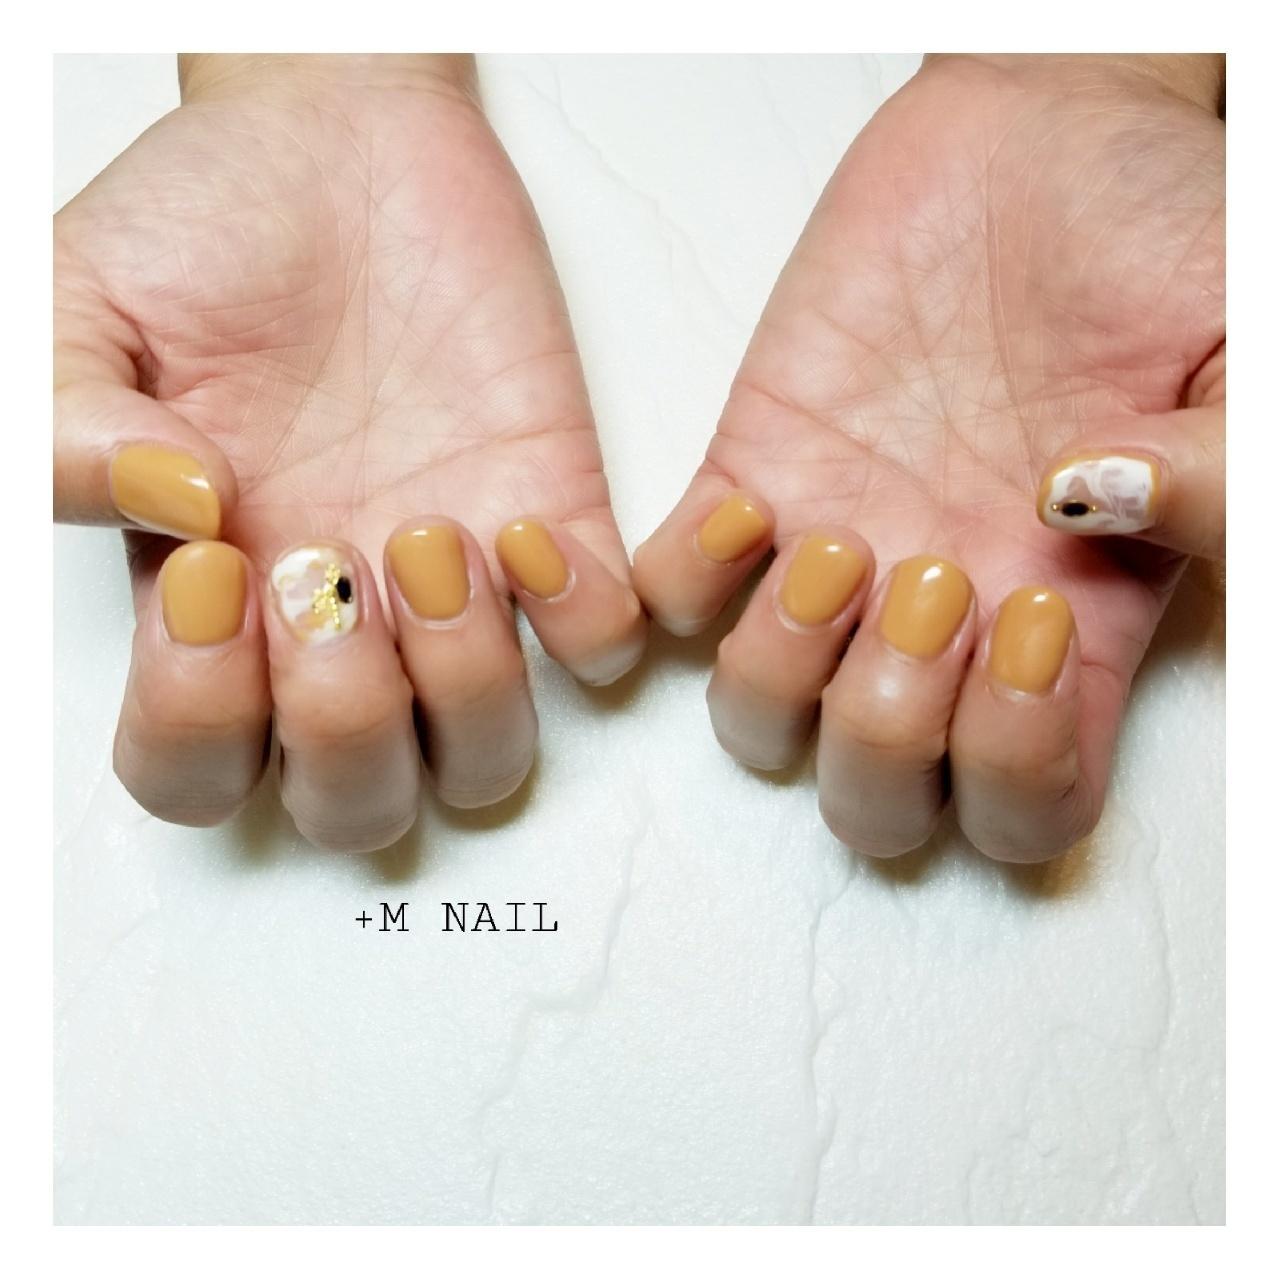 #nails #ジェル #ジェルネイル #ネイル #ネイルサロン #ネイルデザイン #ハンド #大人ネイル #大人可愛い #カジュアルネイル #ワンカラーネイル #ニュアンスネイル #マスタードカラー